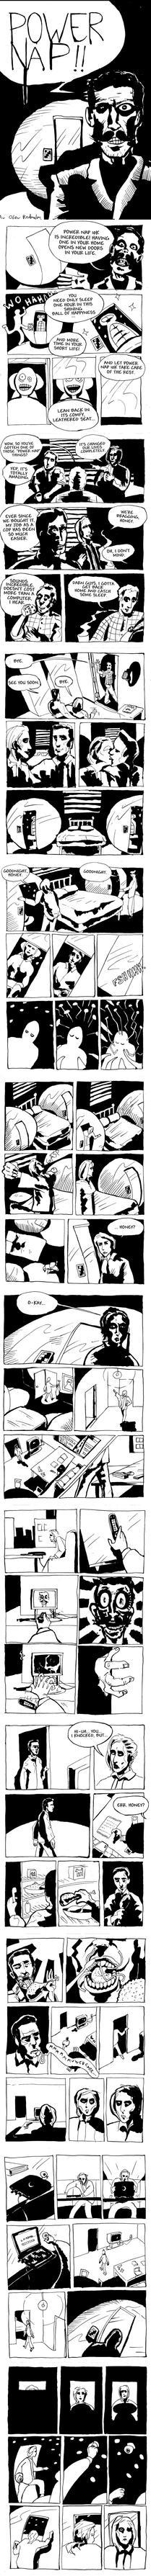 Power Nap - Speed comic by Dragonbaze